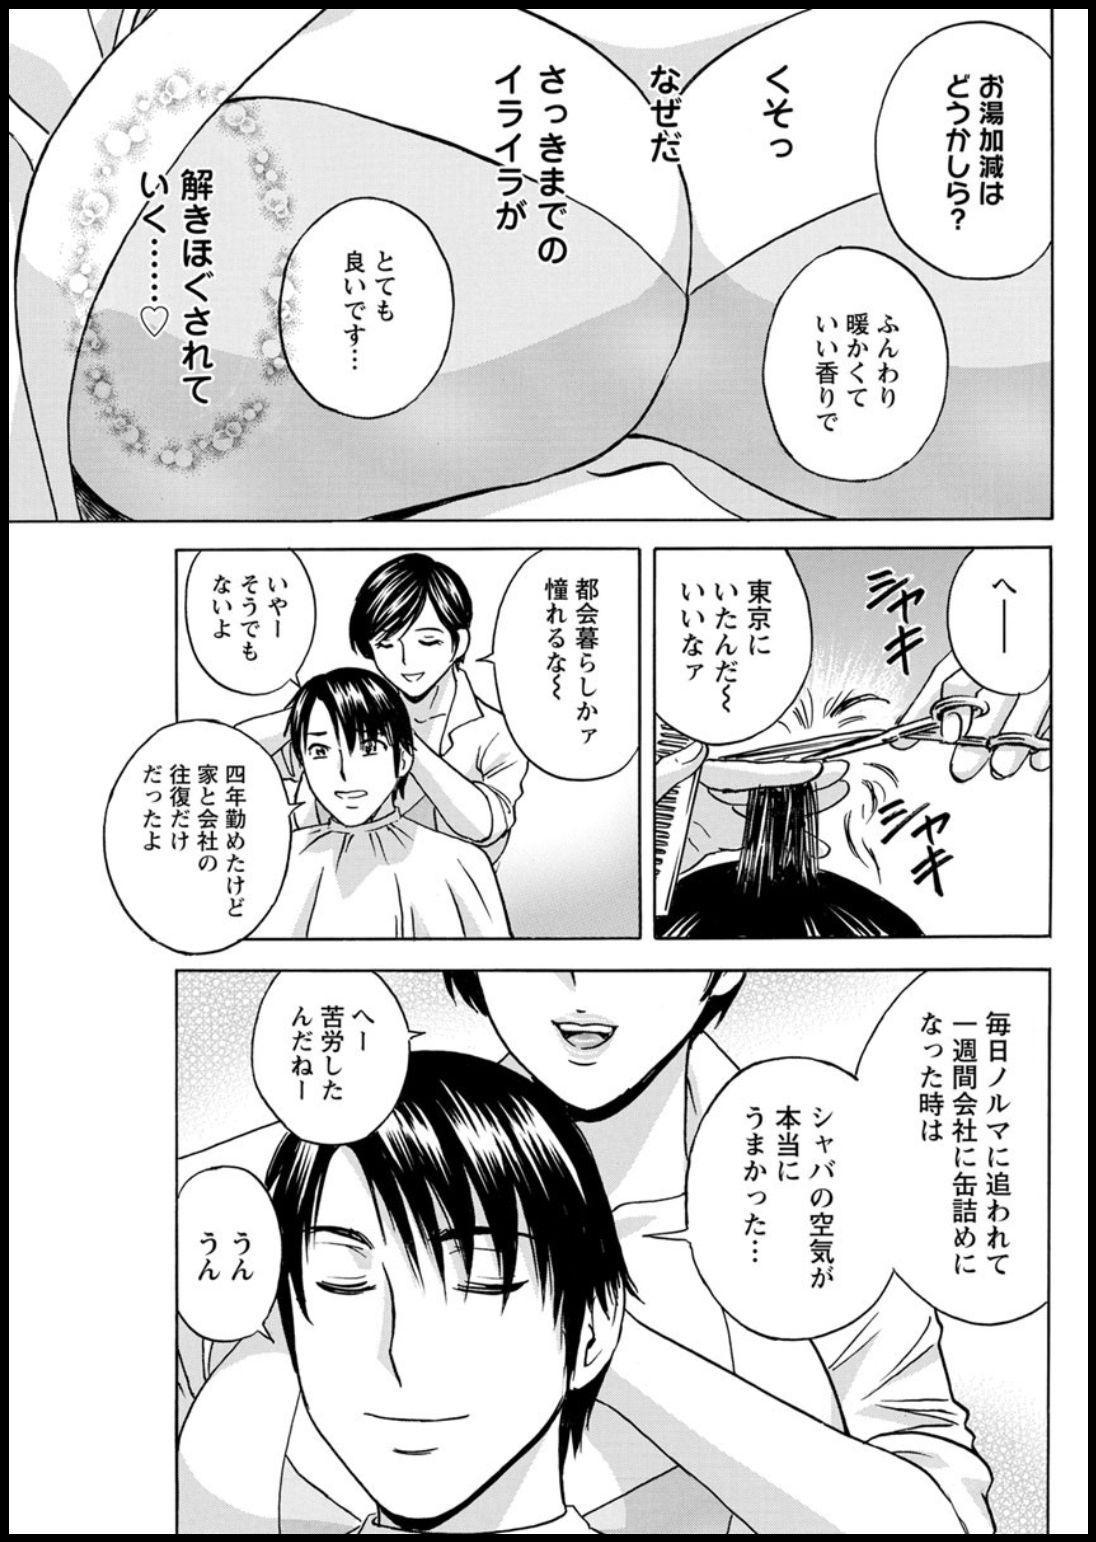 [Hidemaru] Yurase Bikyonyuu! Hataraku J-Cup Ch. 1-5 [Digital] 78